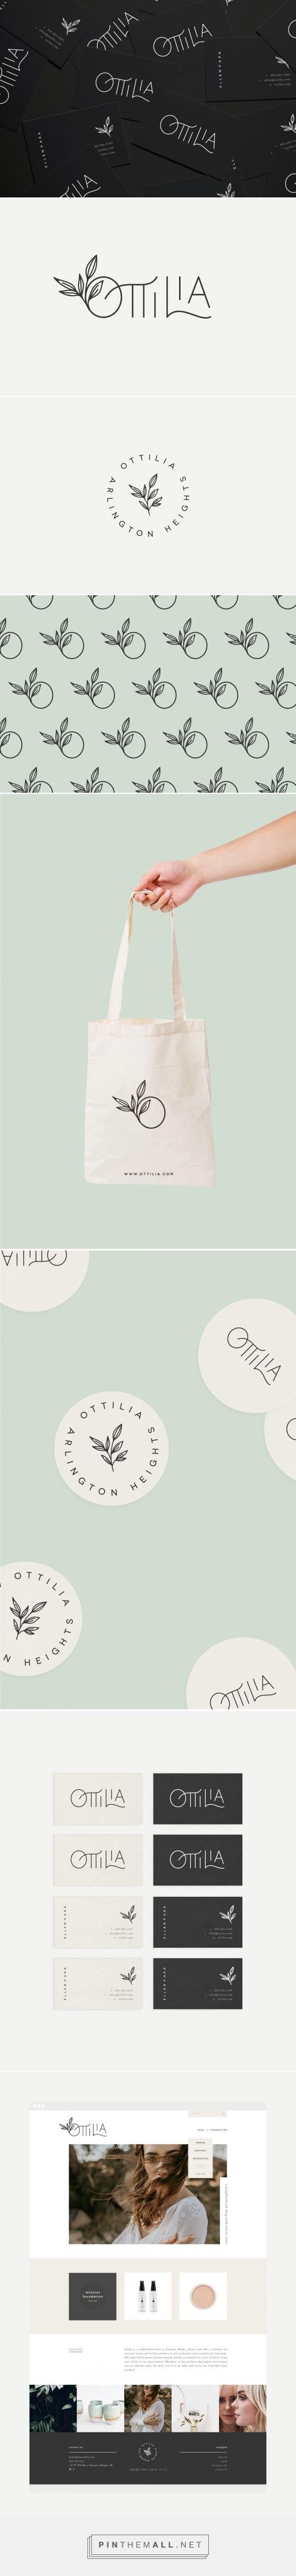 Ottilia Skincare Shop Branding by Rowan Made